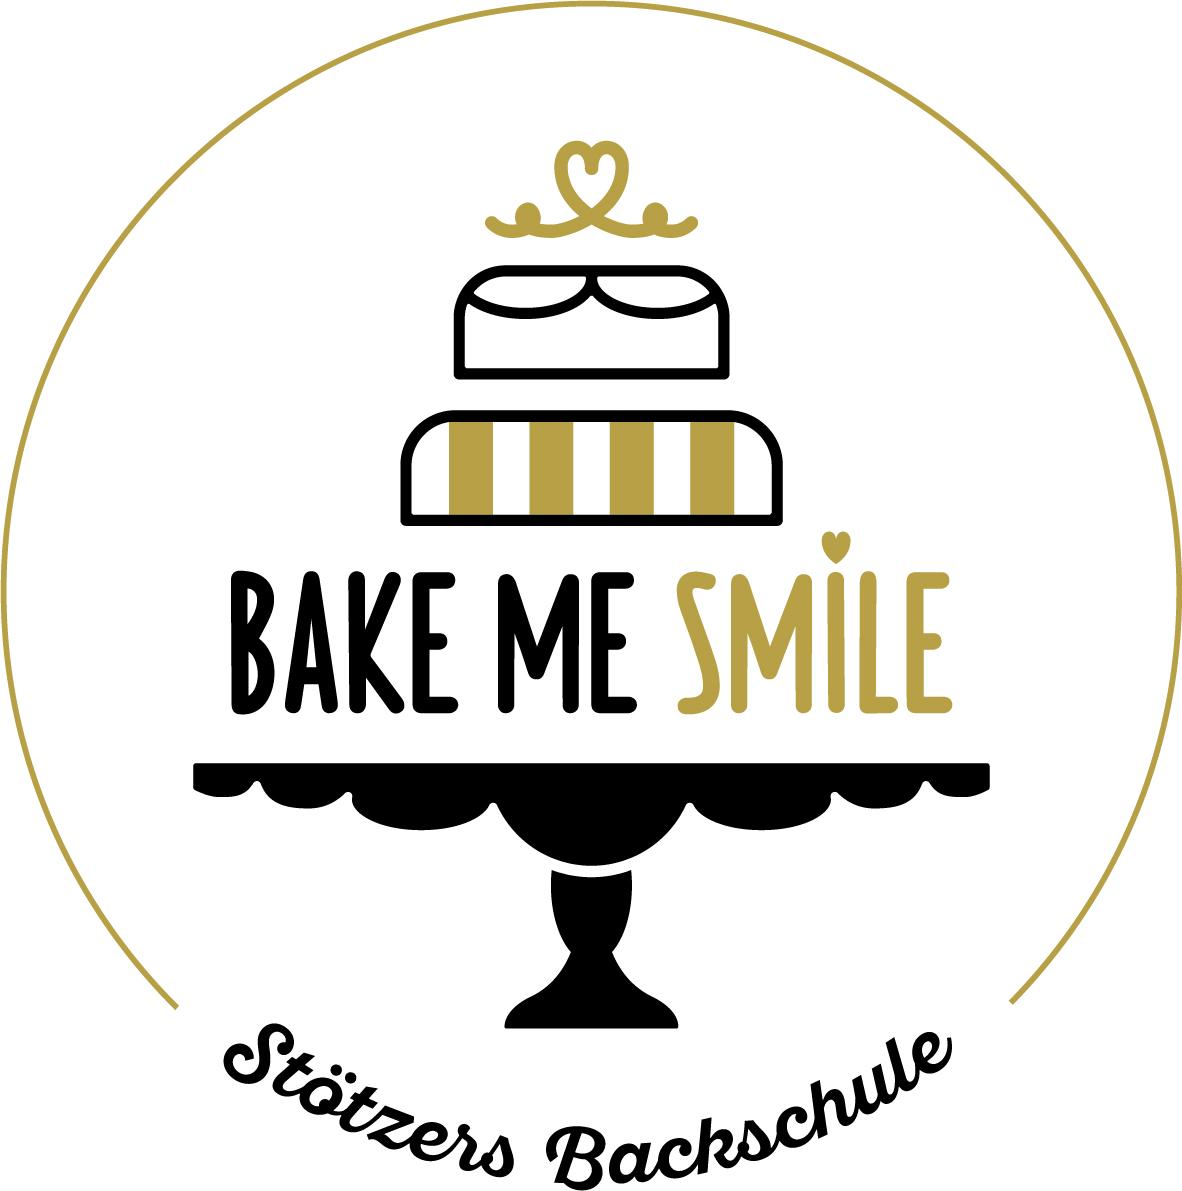 BAKE ME SMILE